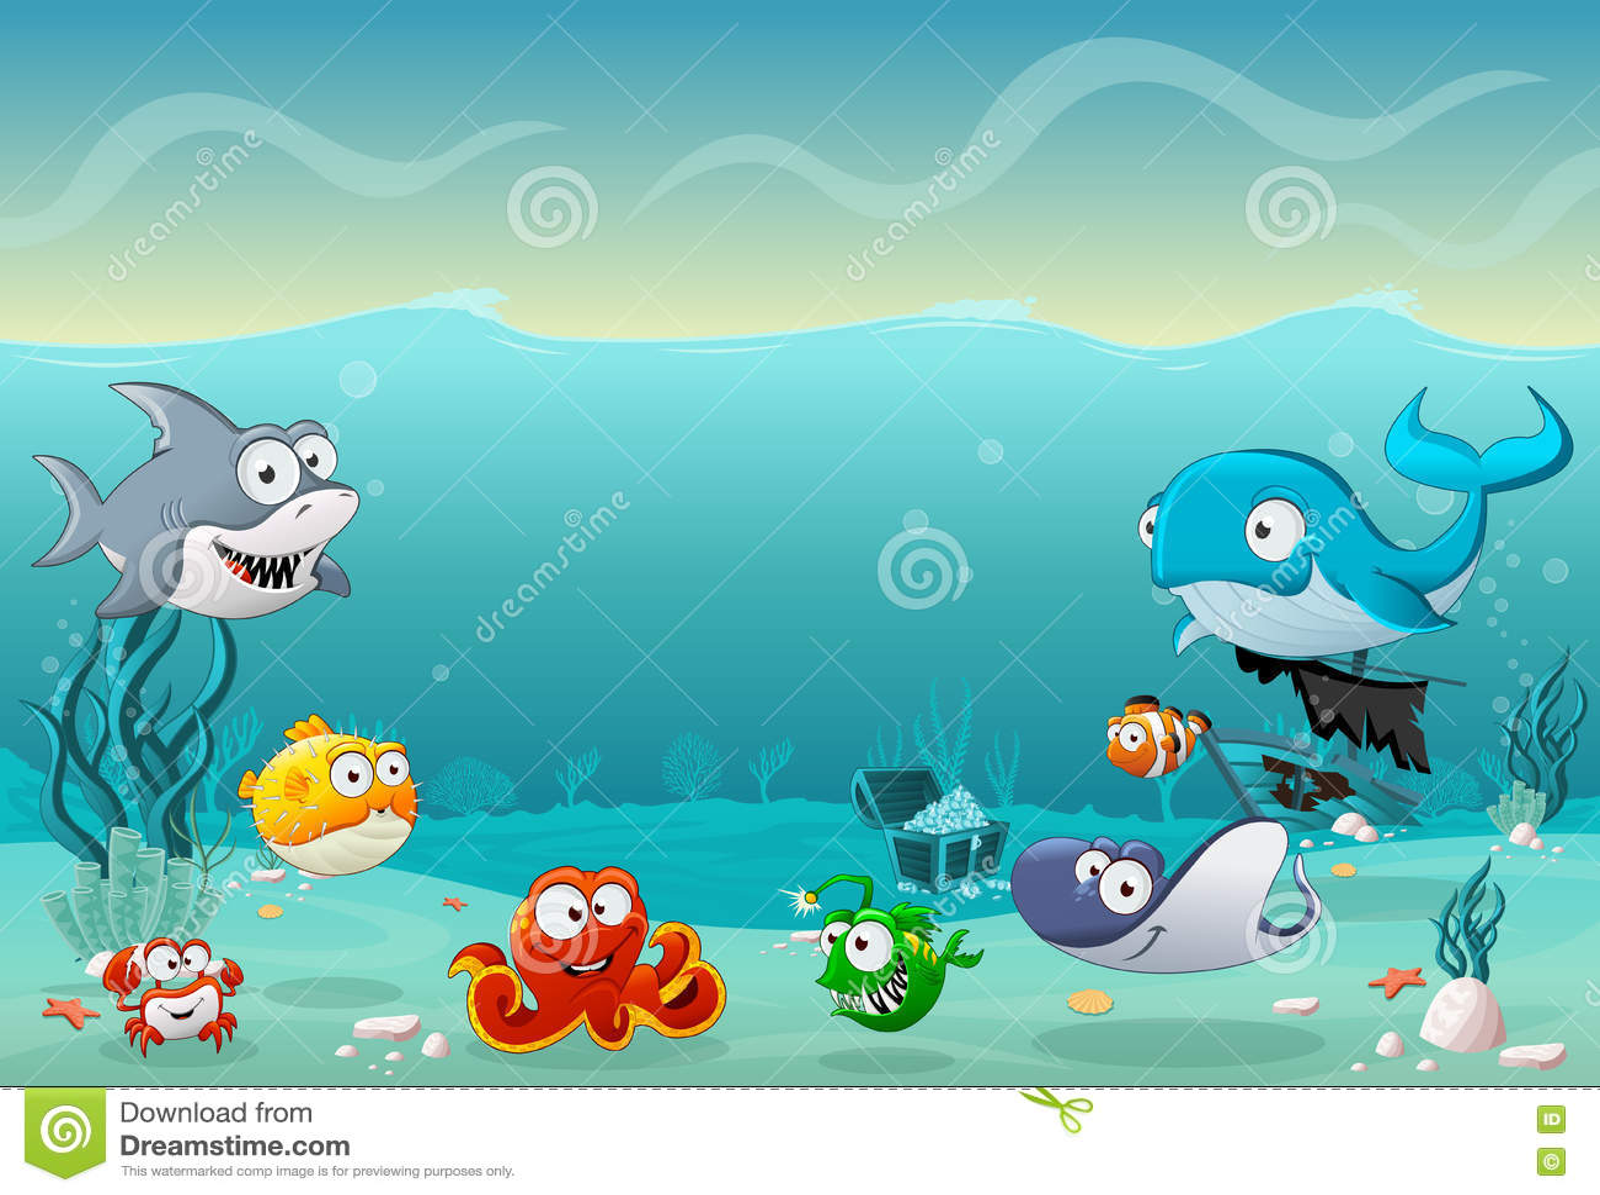 Cartoon Whale Under The Sea Vector Illustration